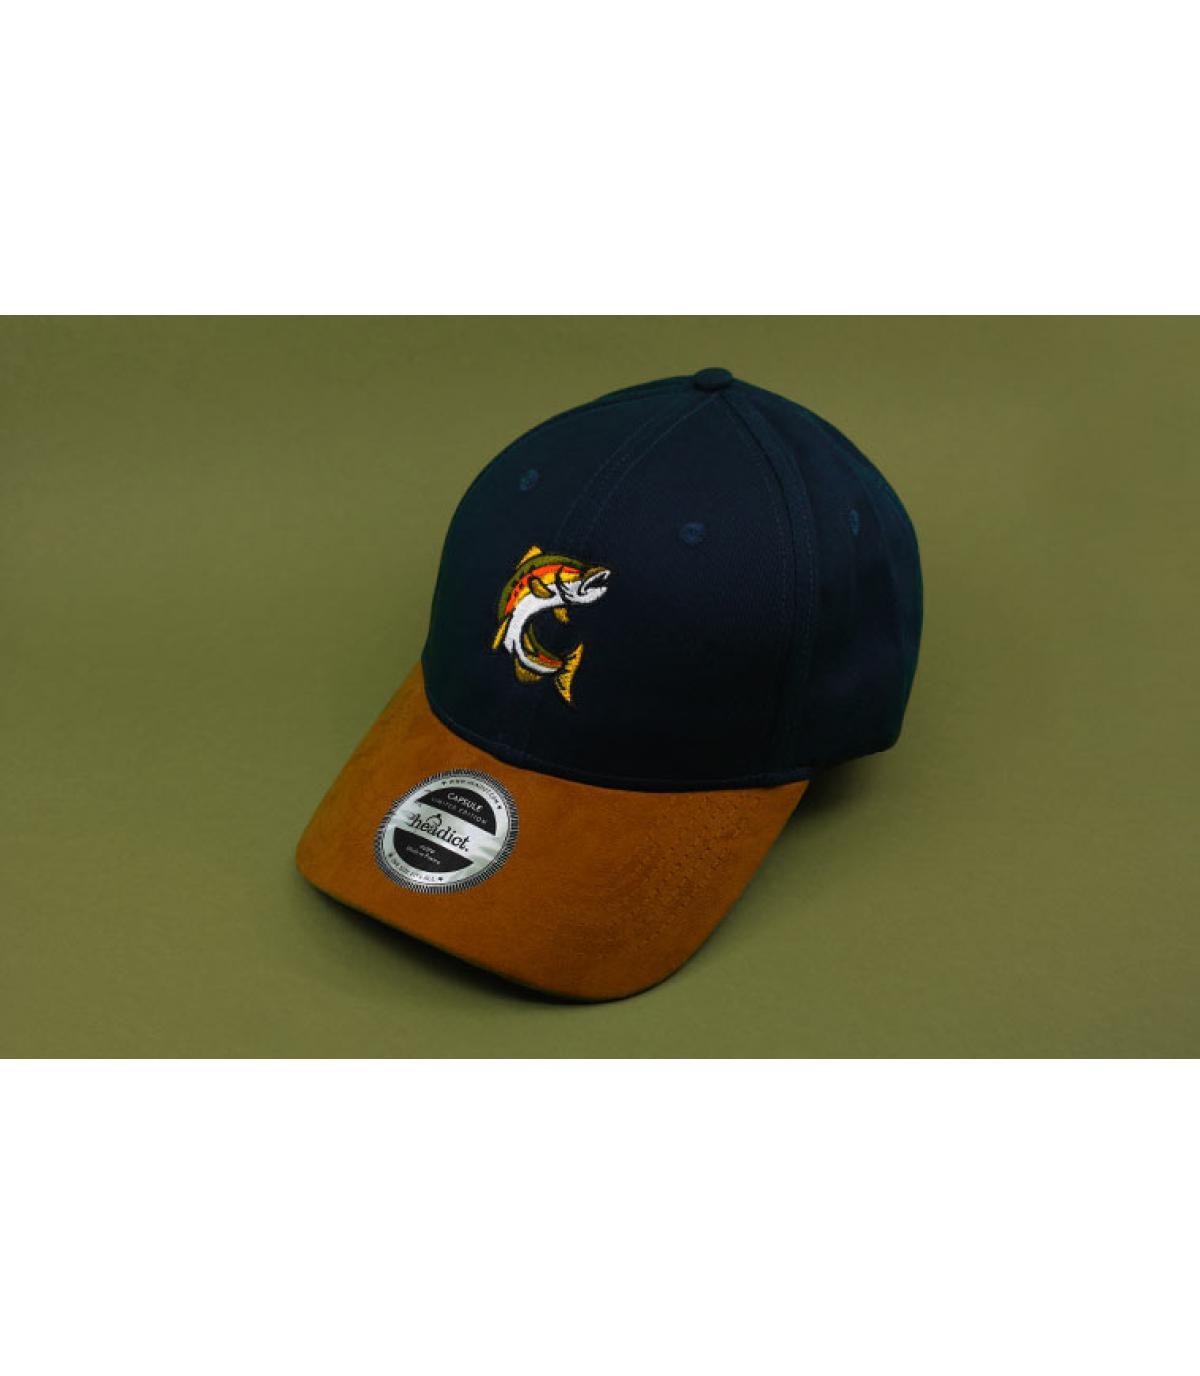 Angler Cap